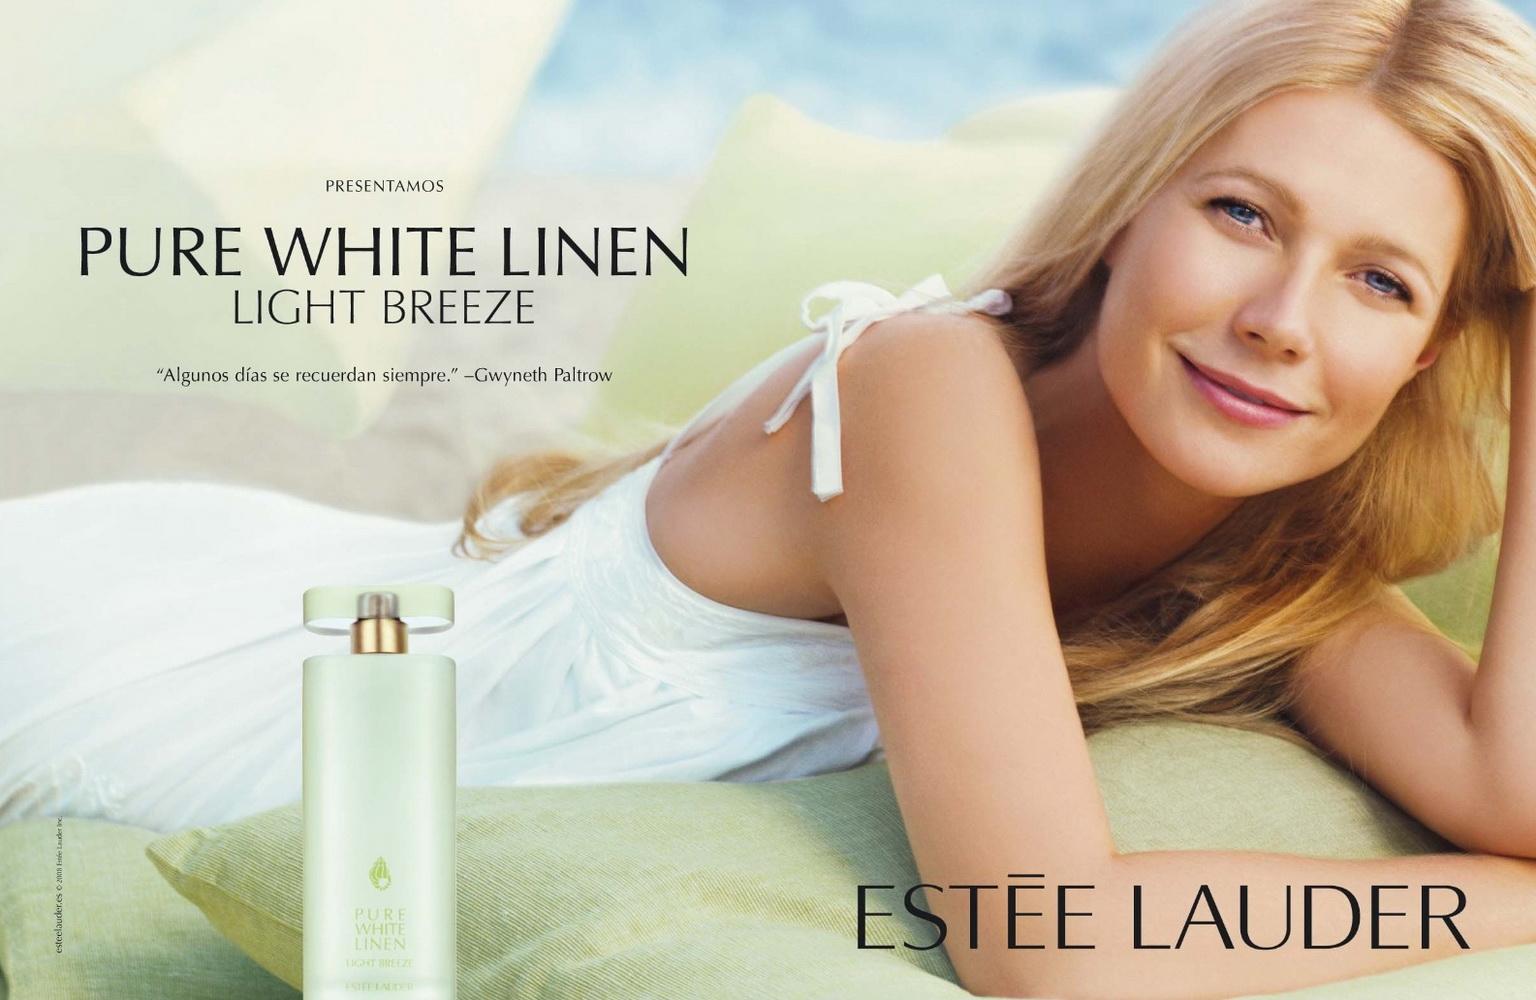 Gwyneth Paltrow in Estee Lauder's perfume ad